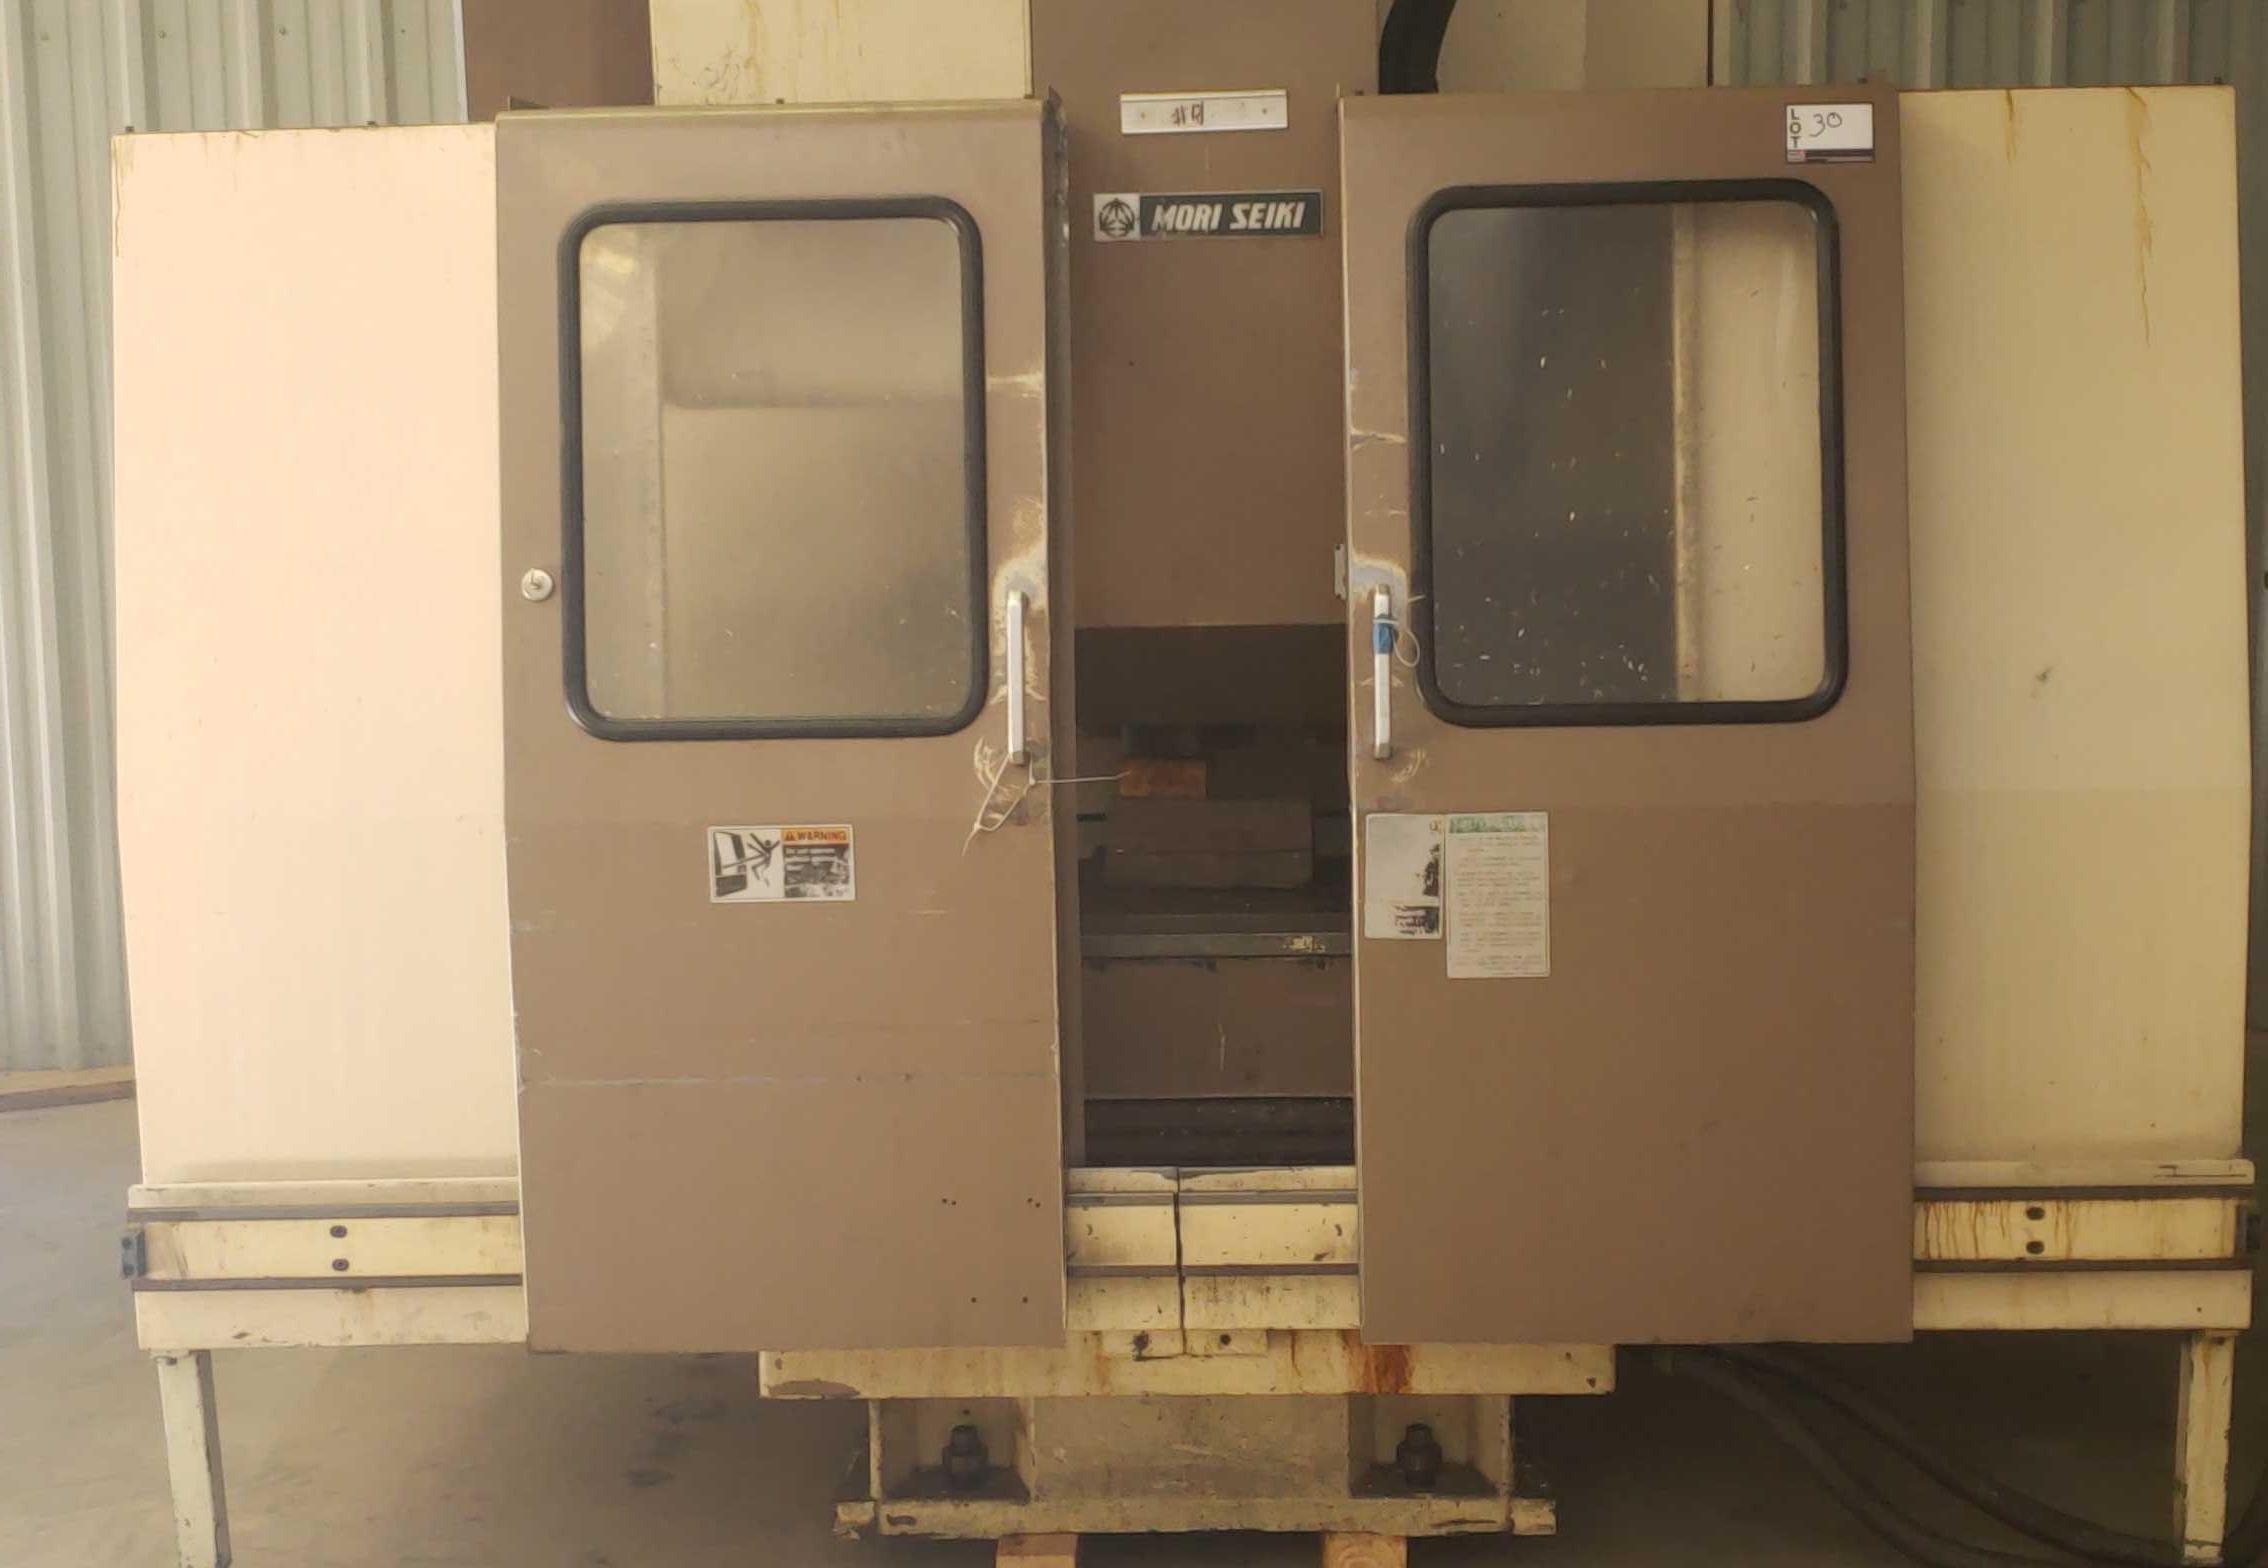 "Mori Seiki MV 40B CNC Mill, Fanuc 11M control w/ LCD screen CAT 40 spindle, 20 POS ATC, 31.5""x X - Image 2 of 6"